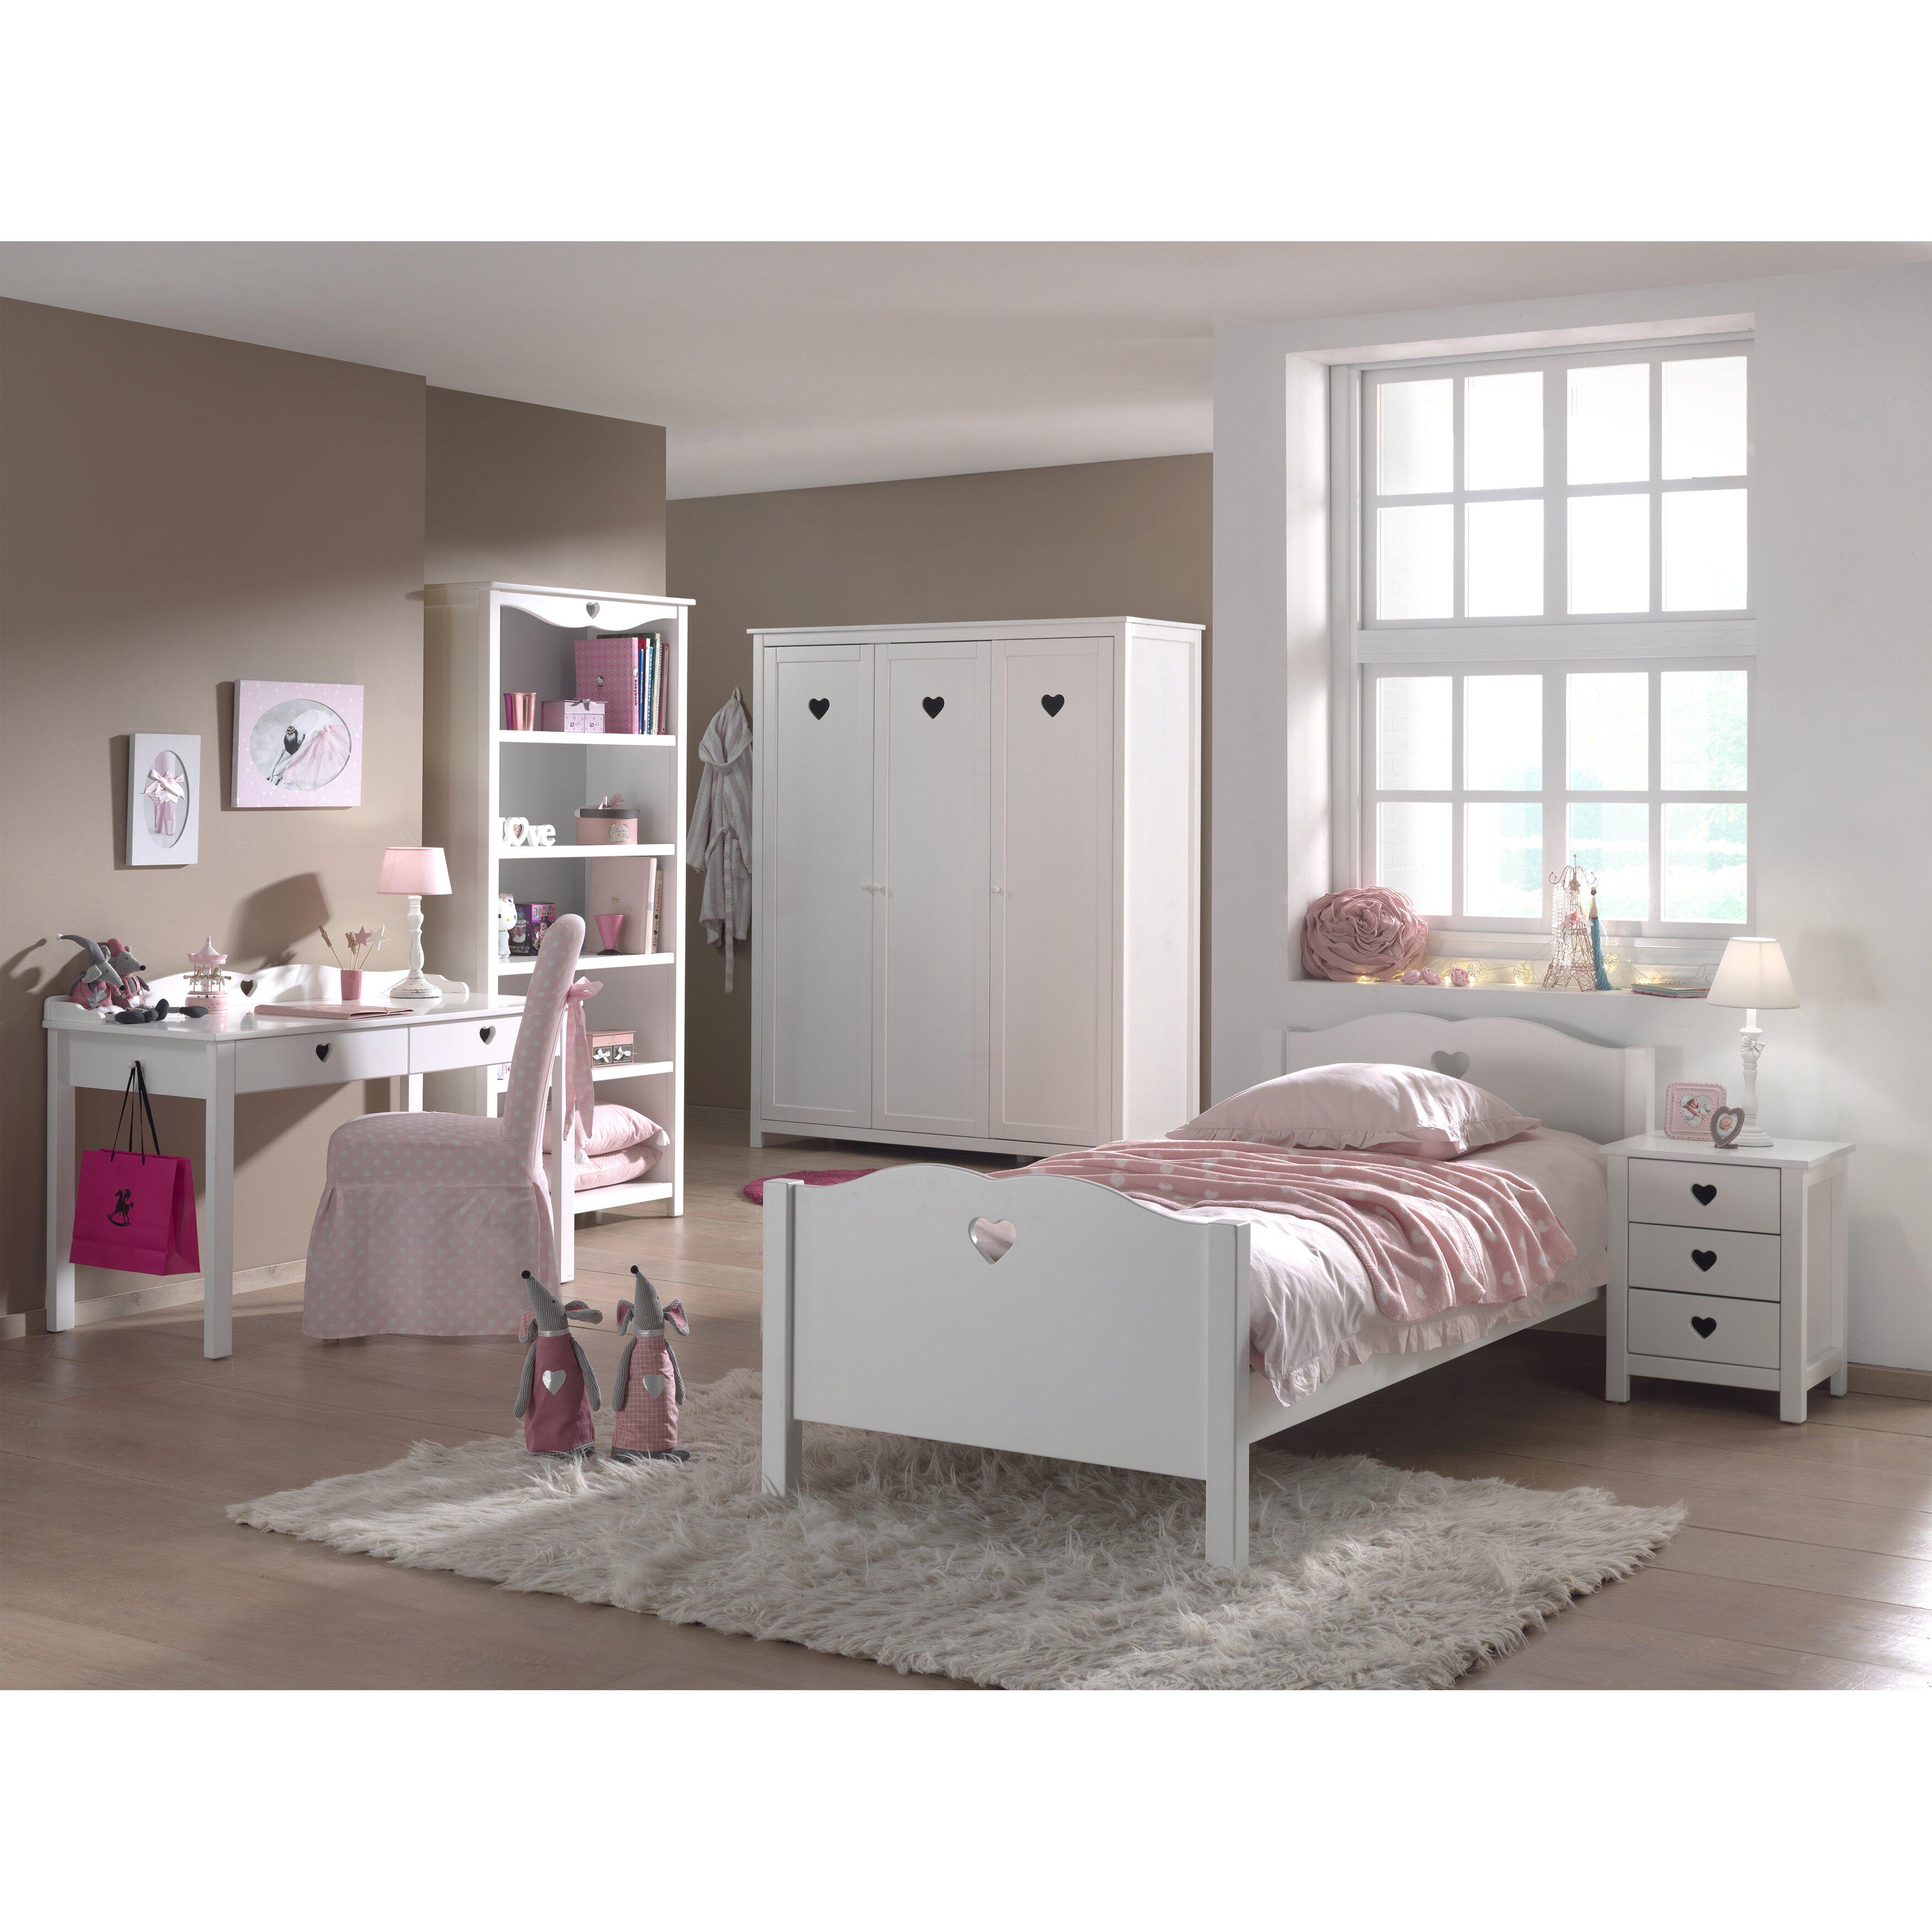 vipack amori 5 piece bedroom set